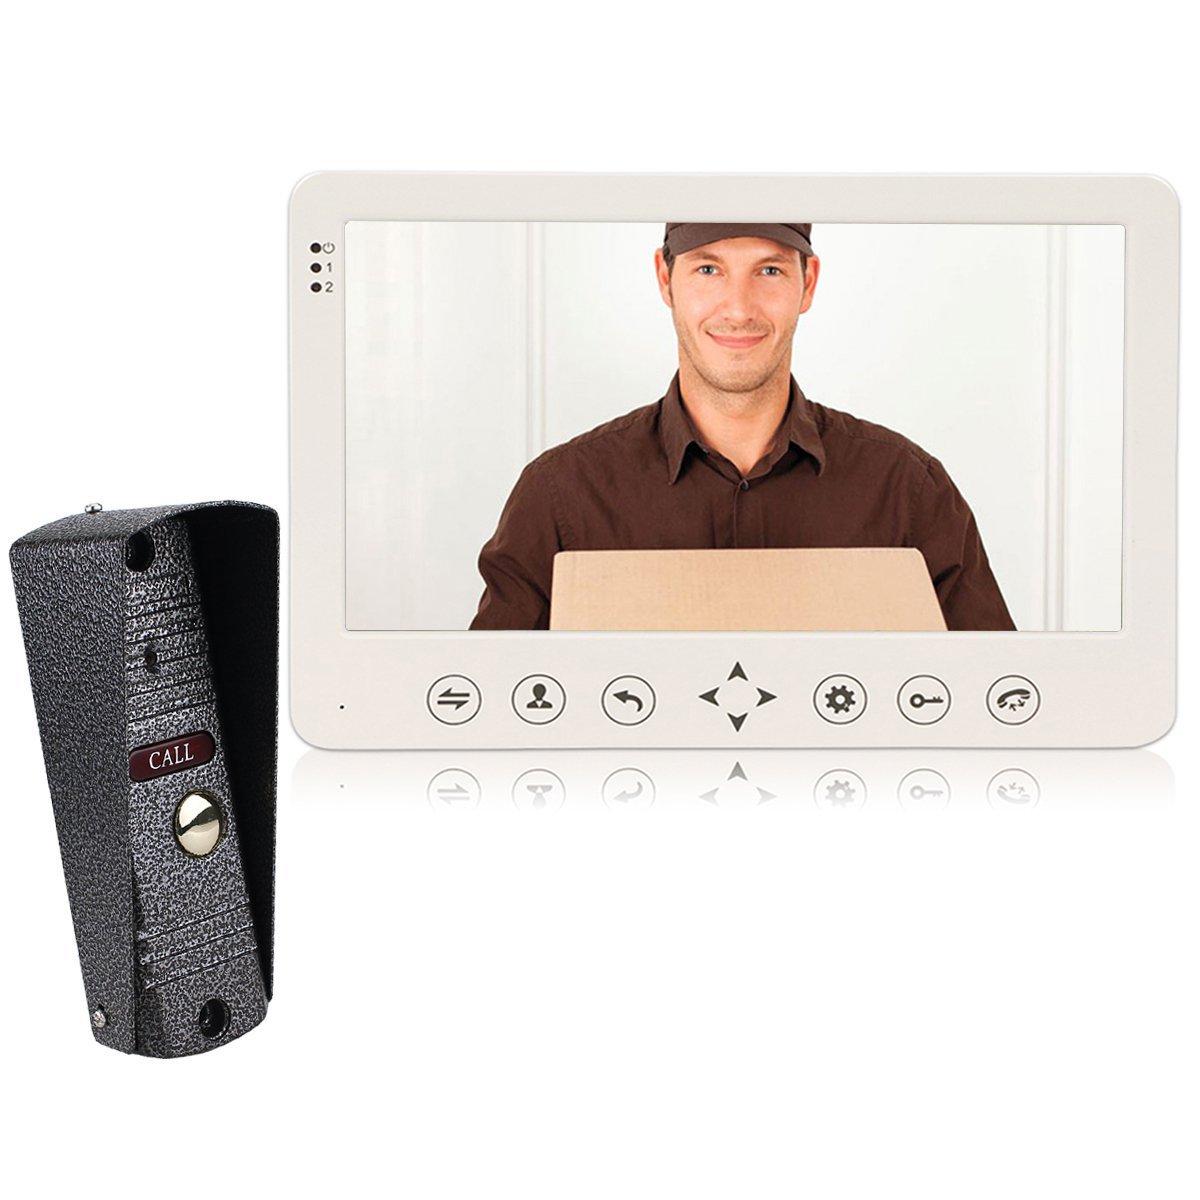 Retekess CP80 Video Door Phone Wired Video Intercom System Night Vision Doorbell Intercom with 1 IR Night Doorbell Camera and 1 Hands Free Monitor Intercom Doorbell (1 Monitor 1 Camera)